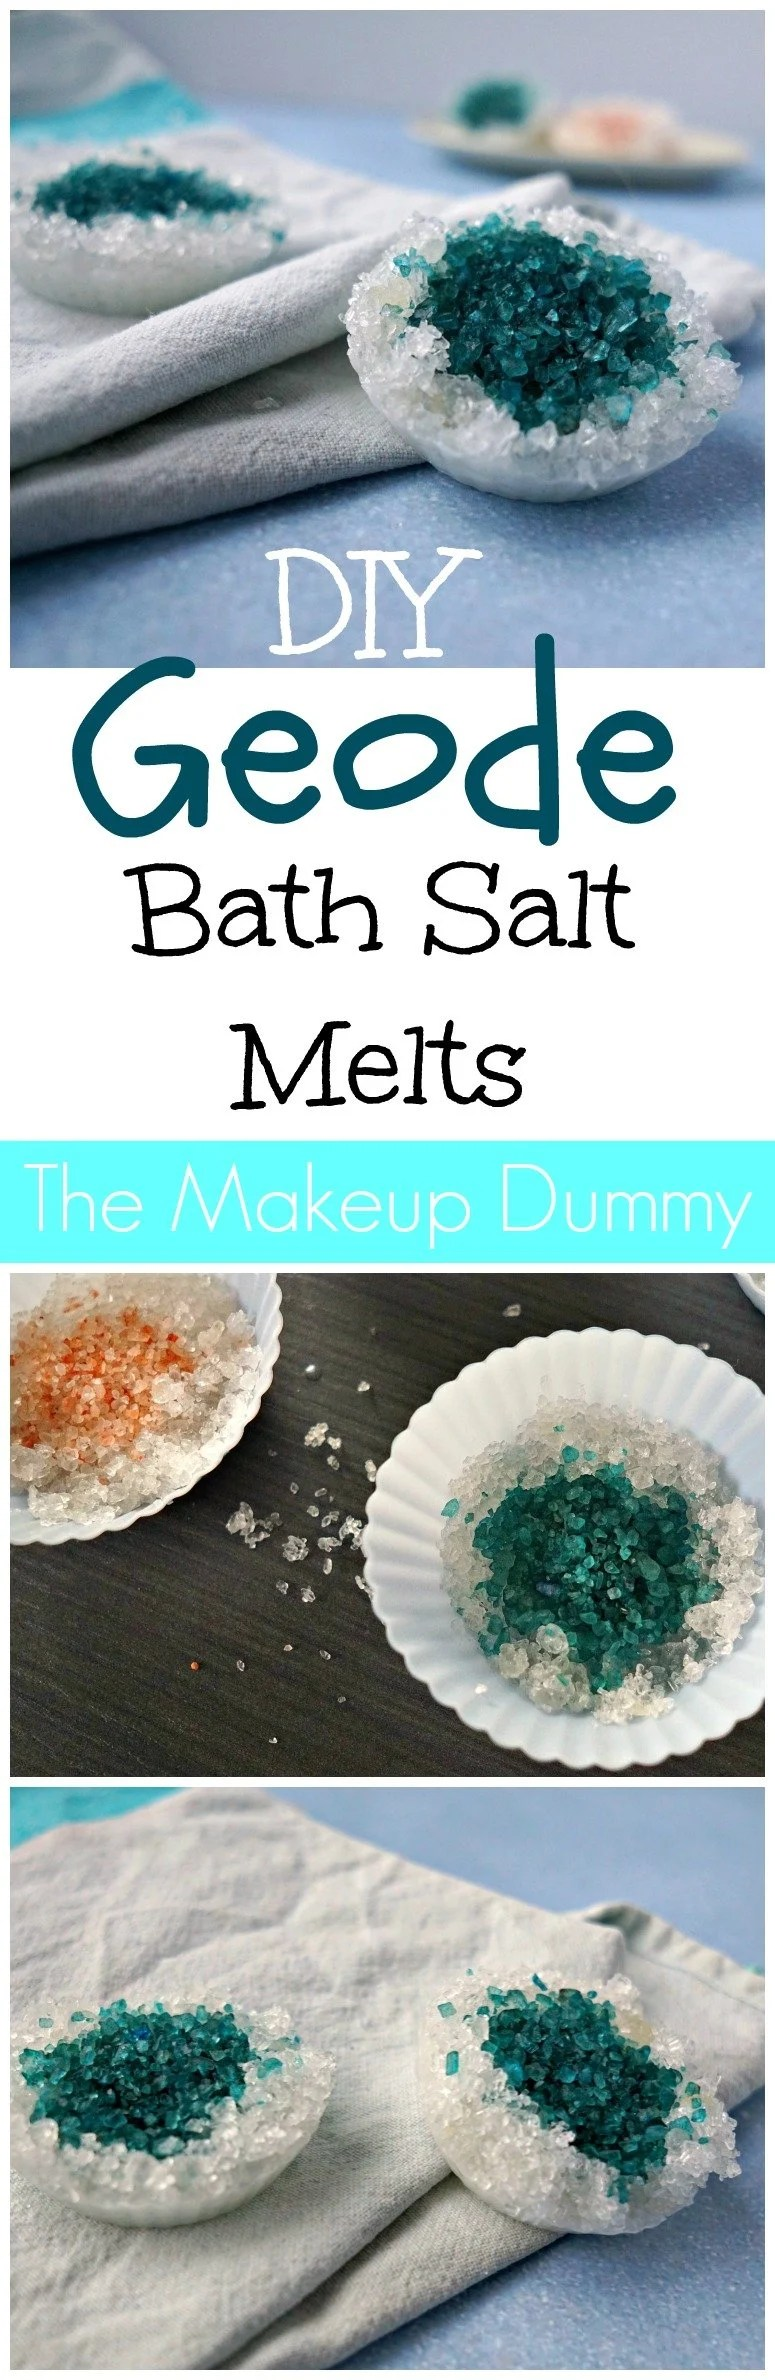 DIY Geode Crystal Rock Epsom Bath Salt Melts - How To tutorial by The Makeup Dummy #diygifts #diybeauty #naturalbeauty